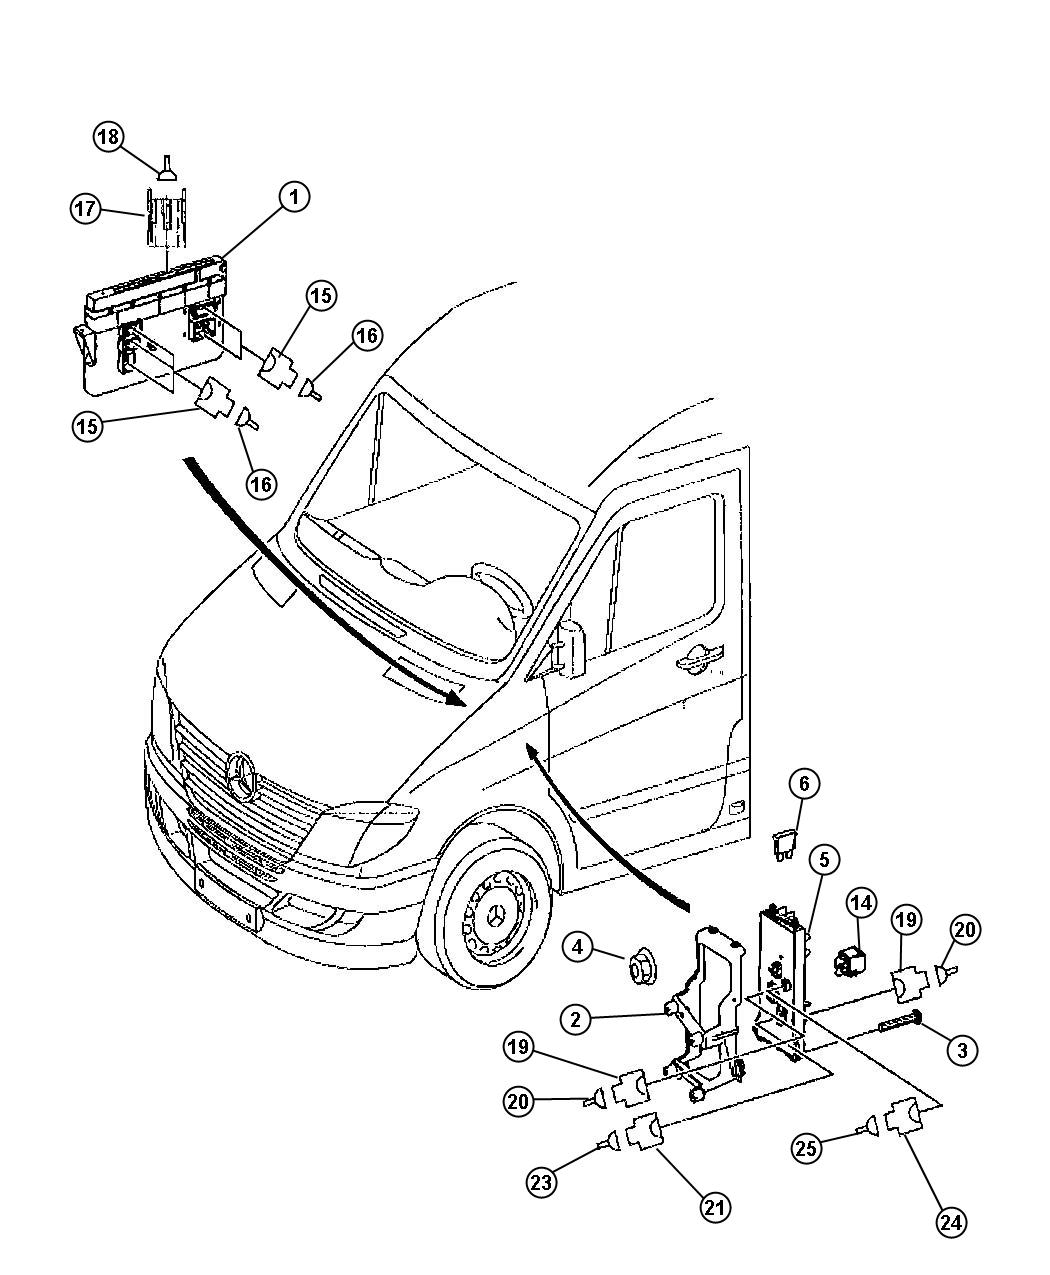 Dodge Sprinter 2500 Fuel Filter Get Free Image Auto Battery Location